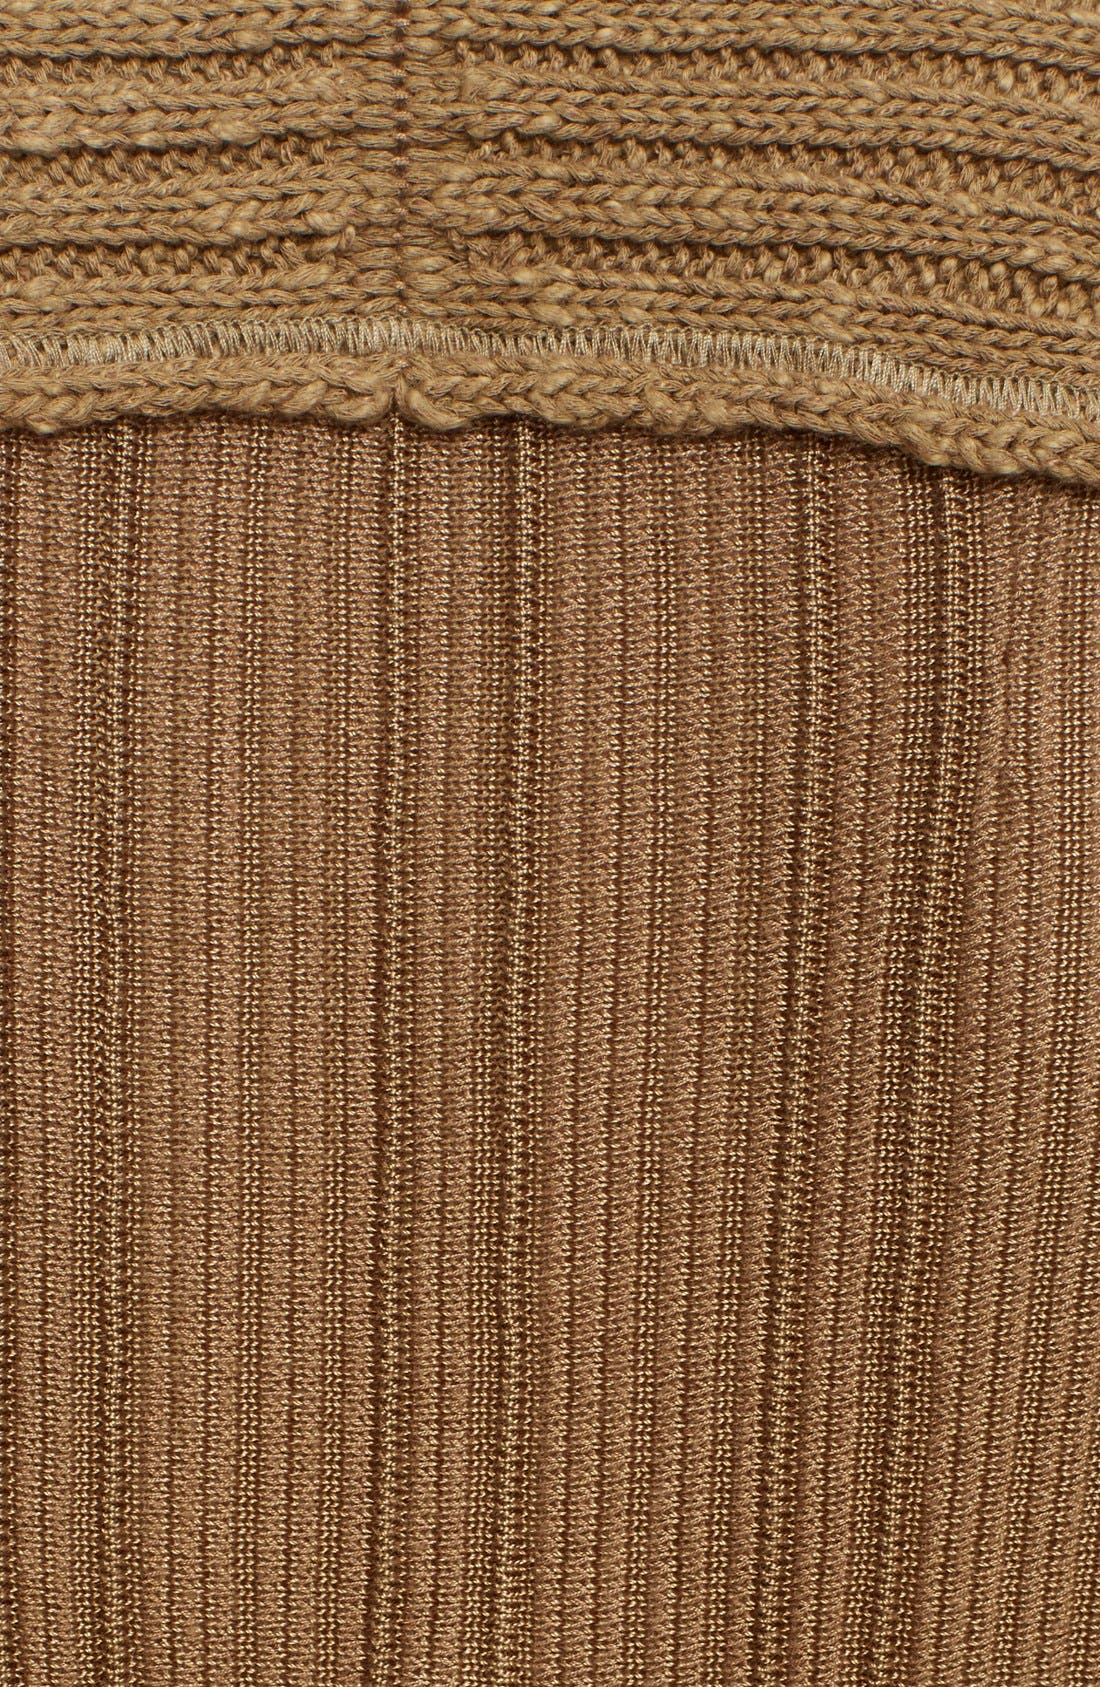 Alternate Image 5  - Free People 'Ribs & Ruffles' Knit Peplum Sweater